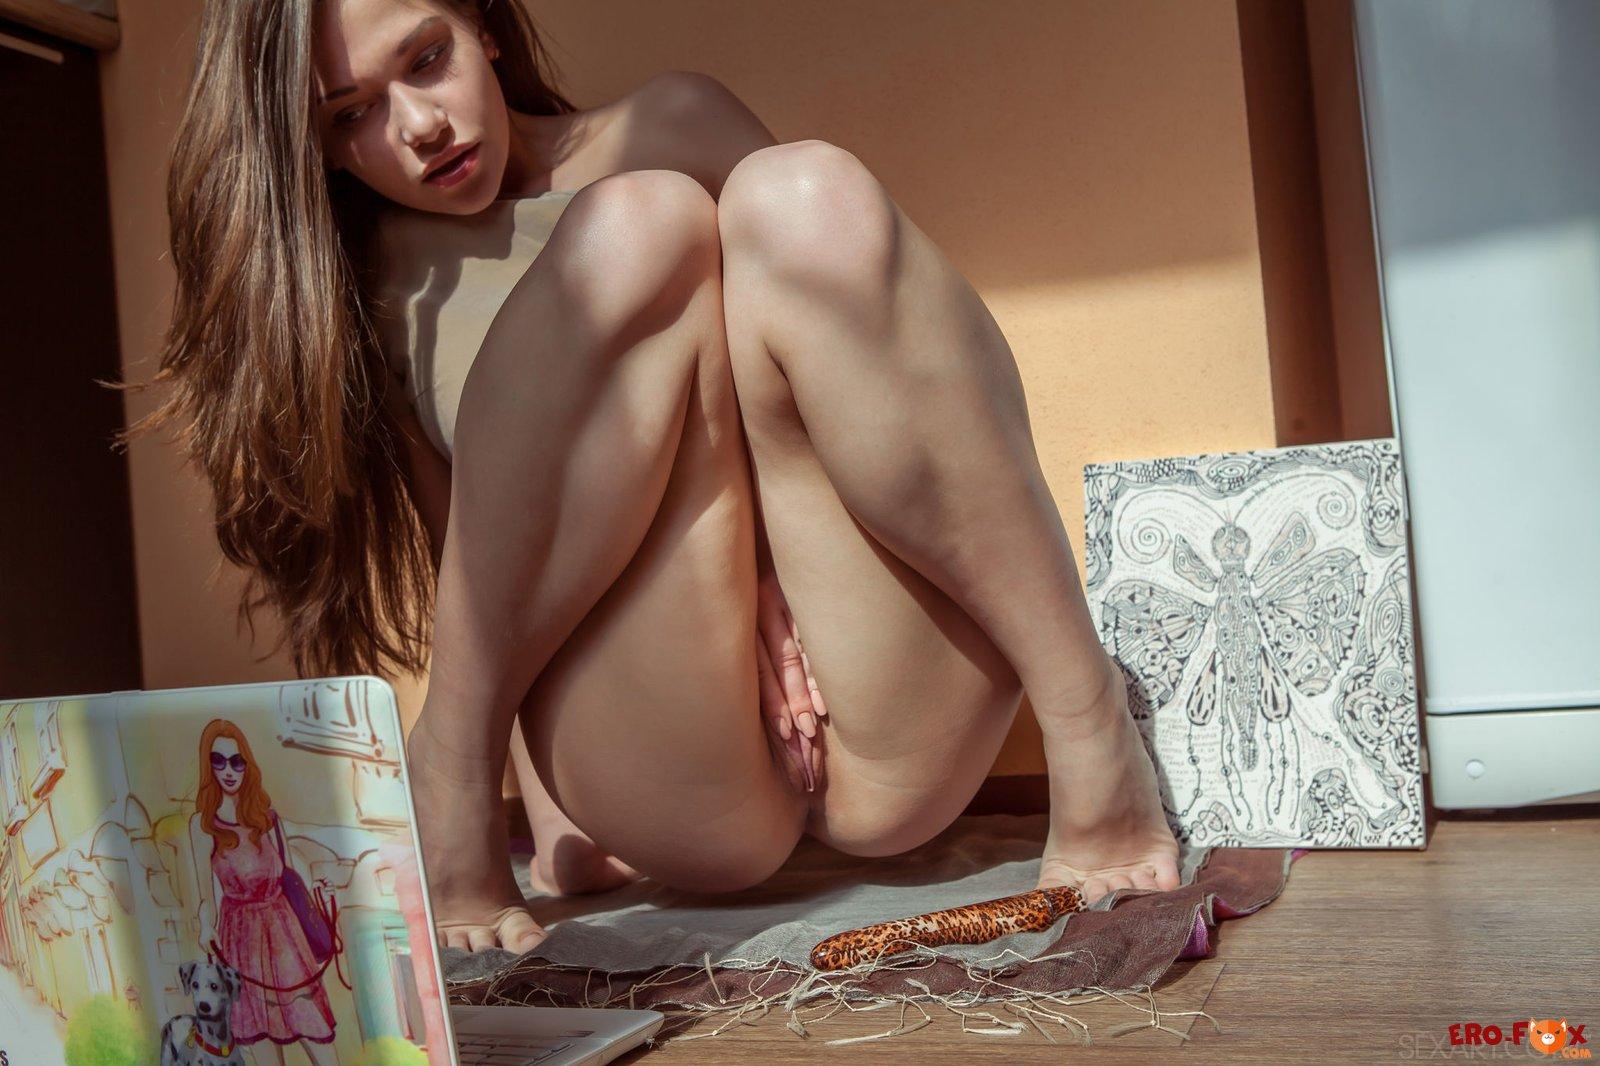 Девушка мастурбирует перед компьютером